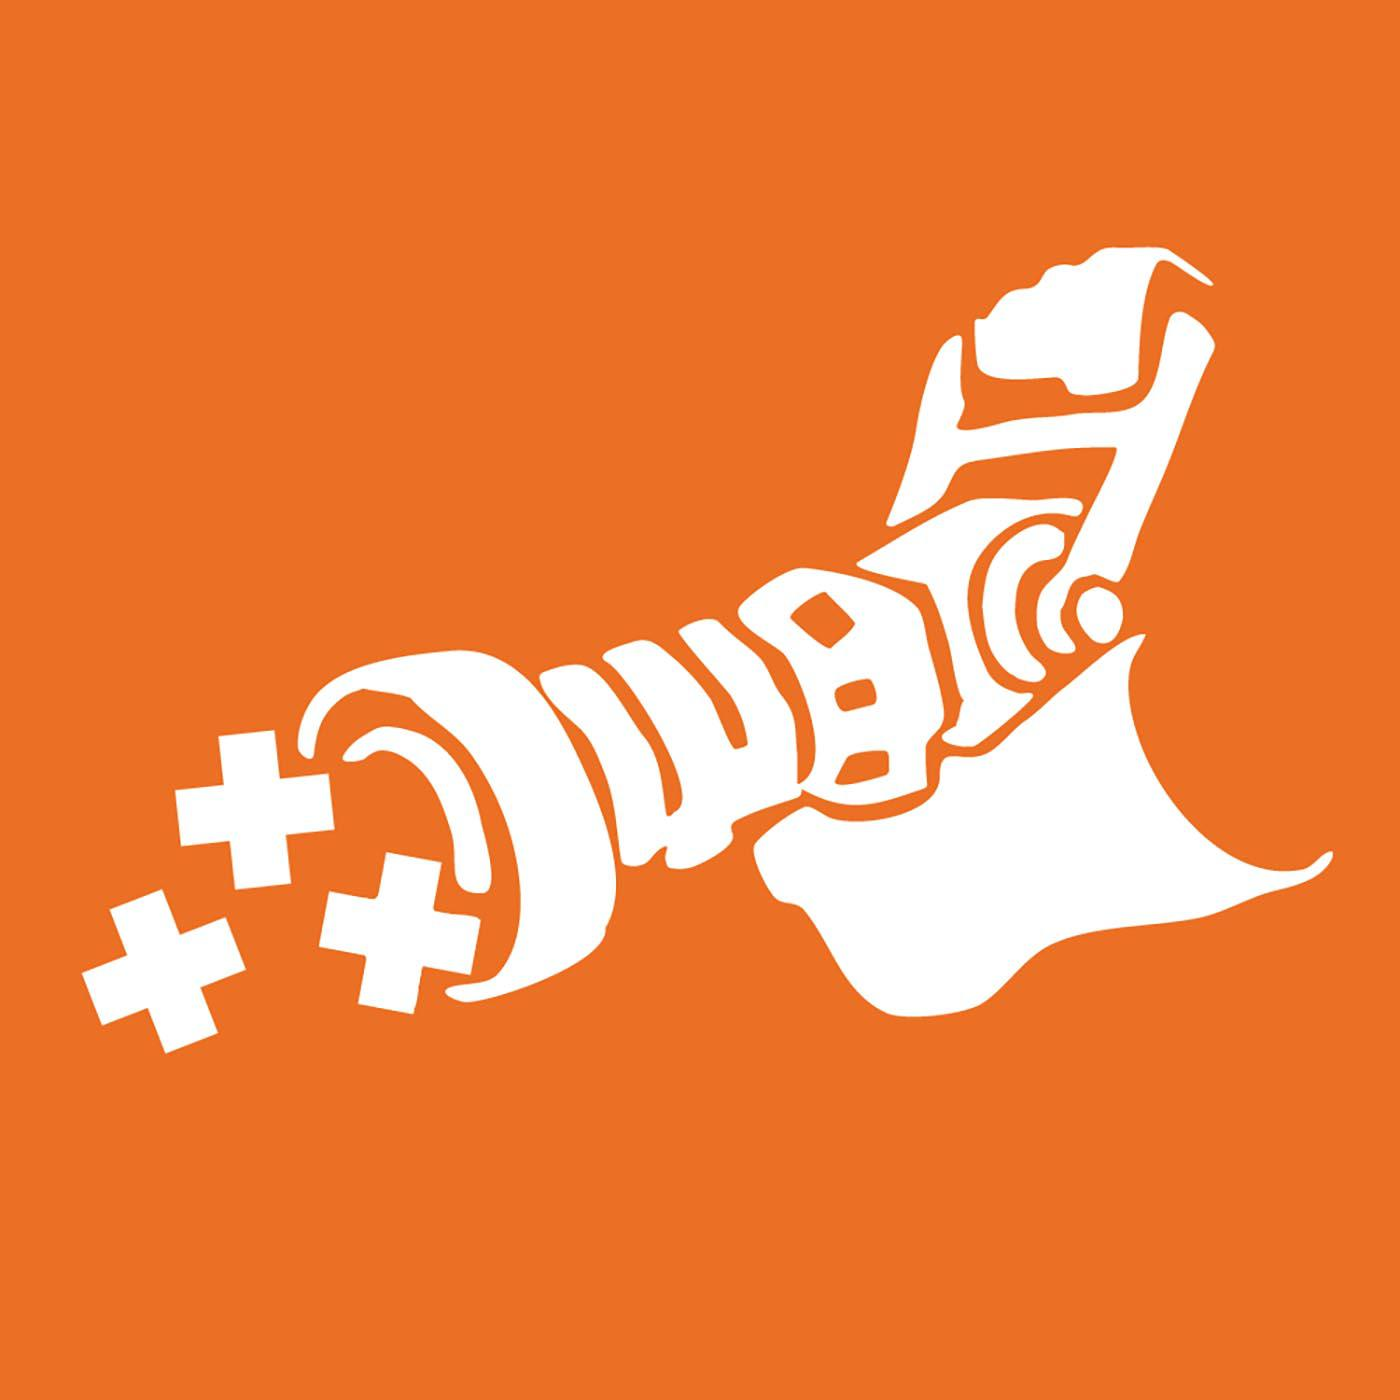 KritzKast #450: To Aar is human - KritzKast (podcast